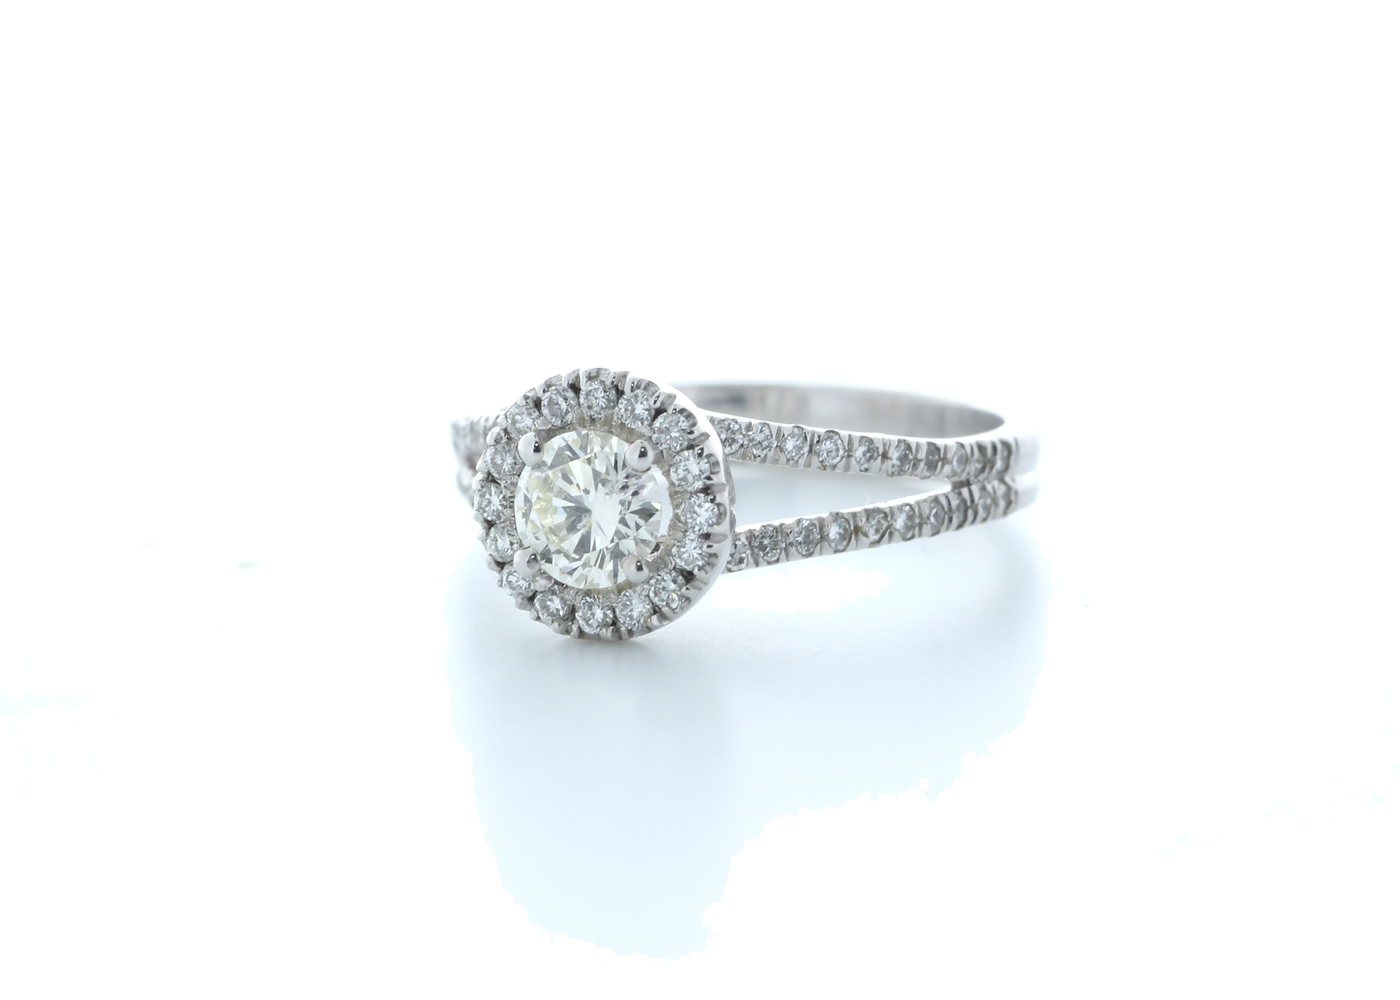 18k White Gold Single Stone With Halo Setting Ring 0.78 (0.45) Carats - Image 2 of 5